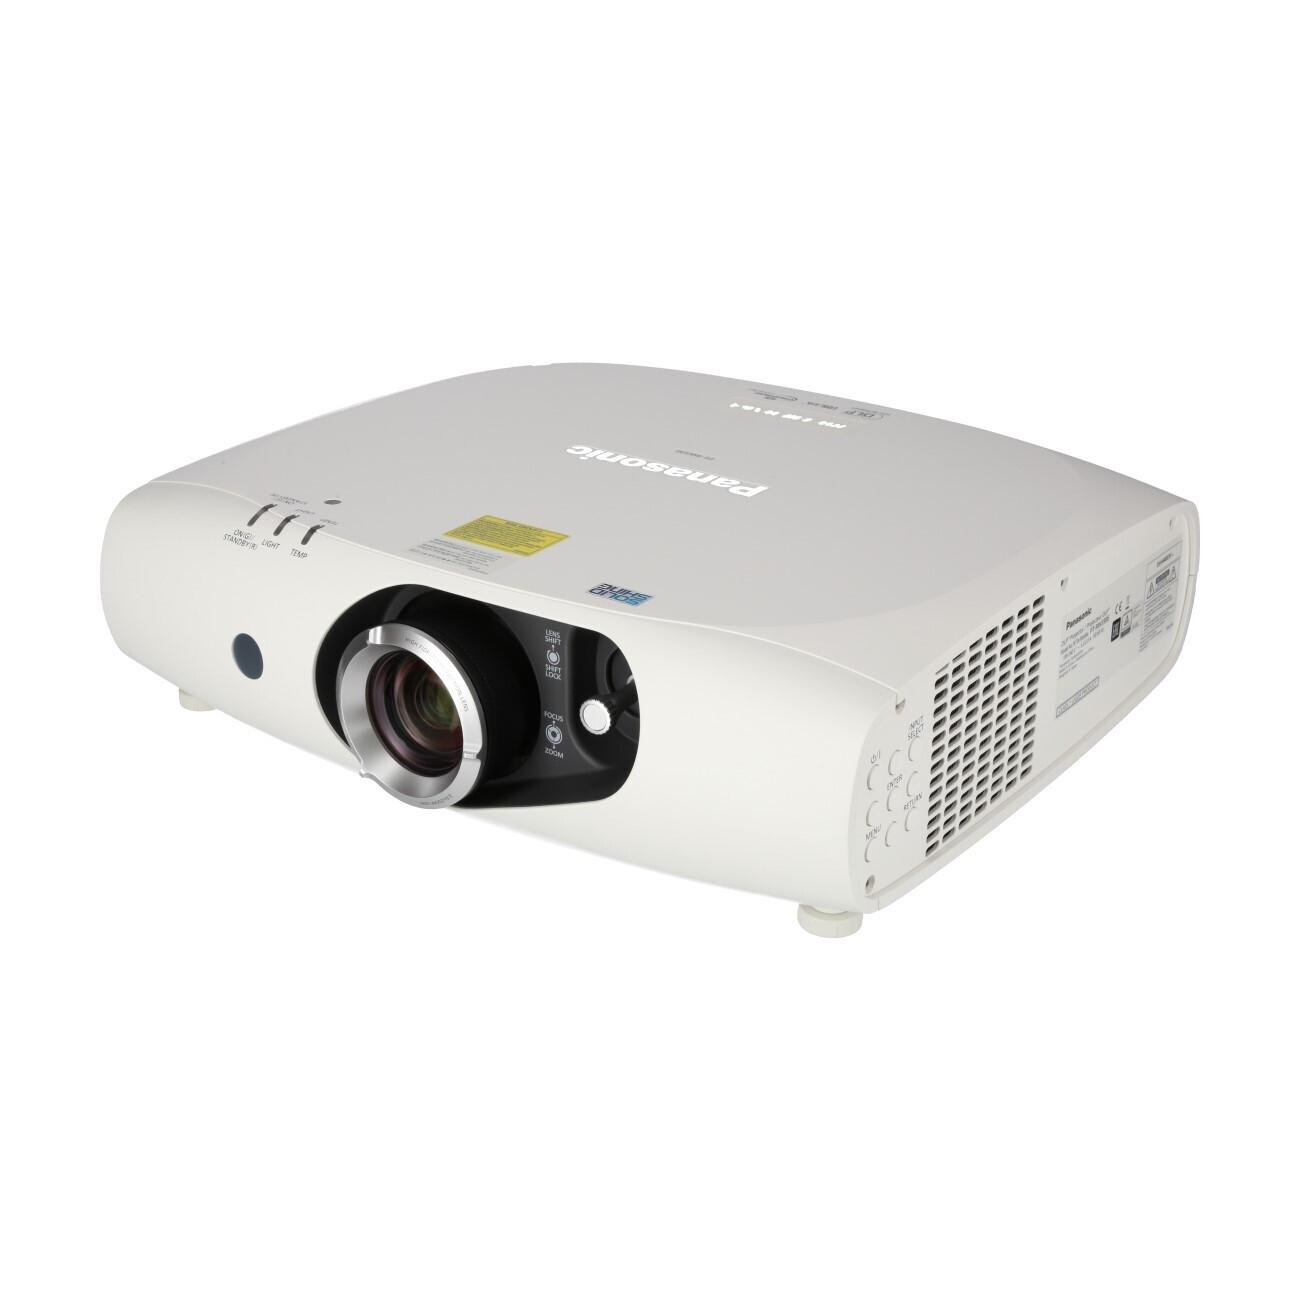 Panasonic PT-RW330E Business Beamer mit 3500 ANSI-Lumen und WXGA